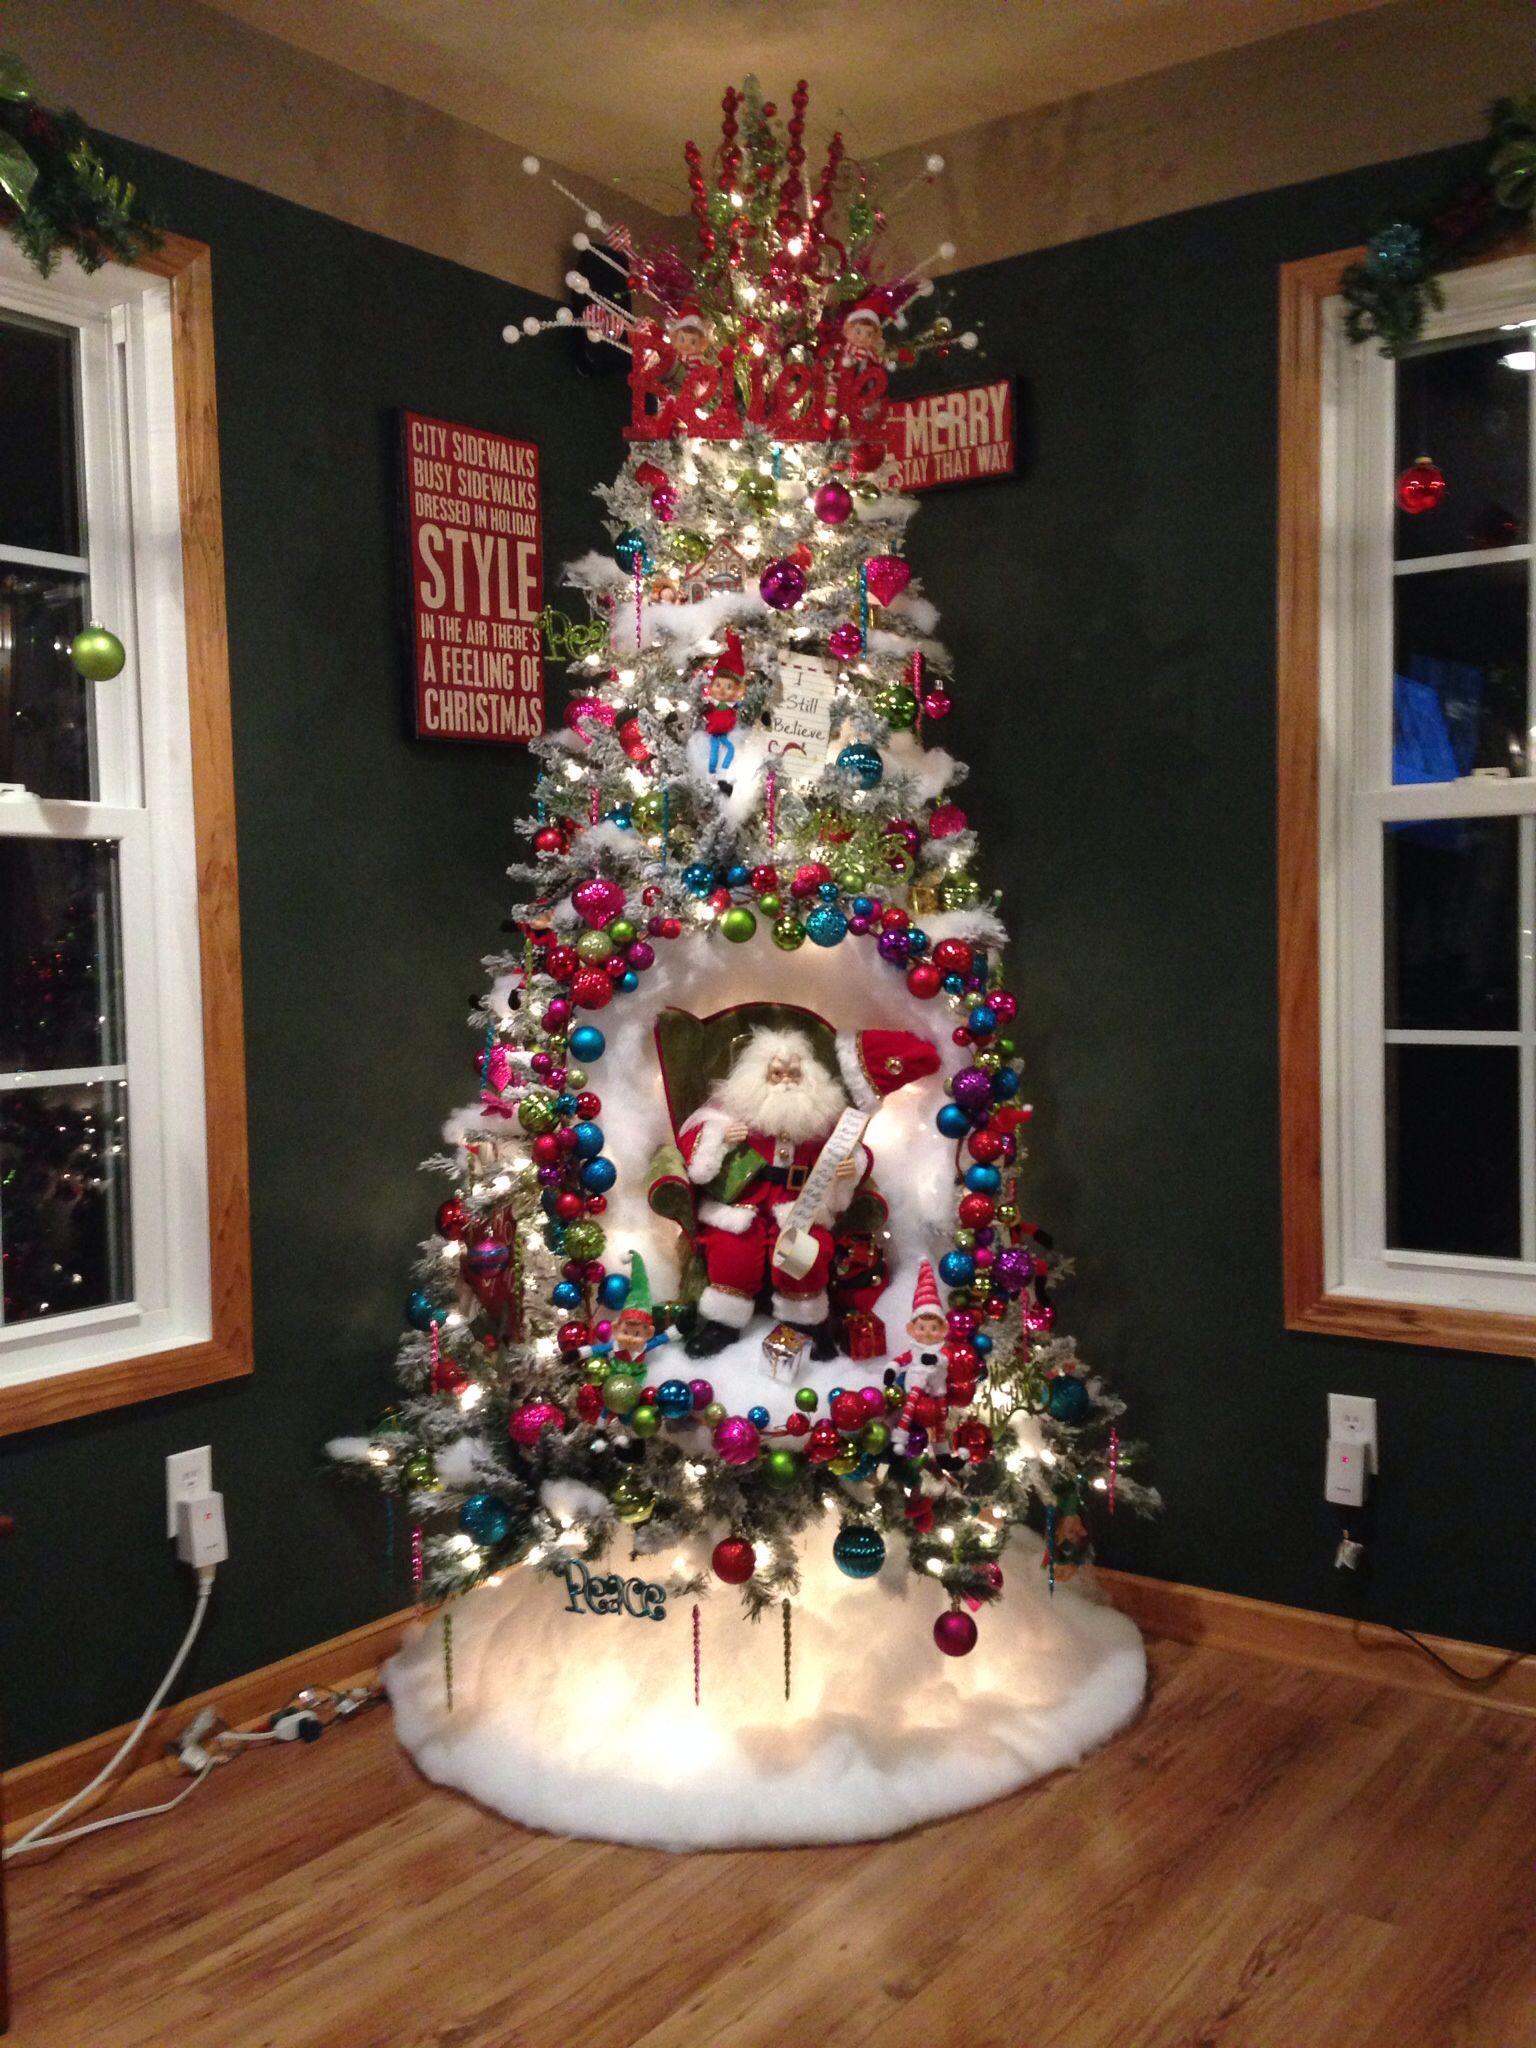 2013 tree done by Sonya Ball Ketchersid Diy christmas